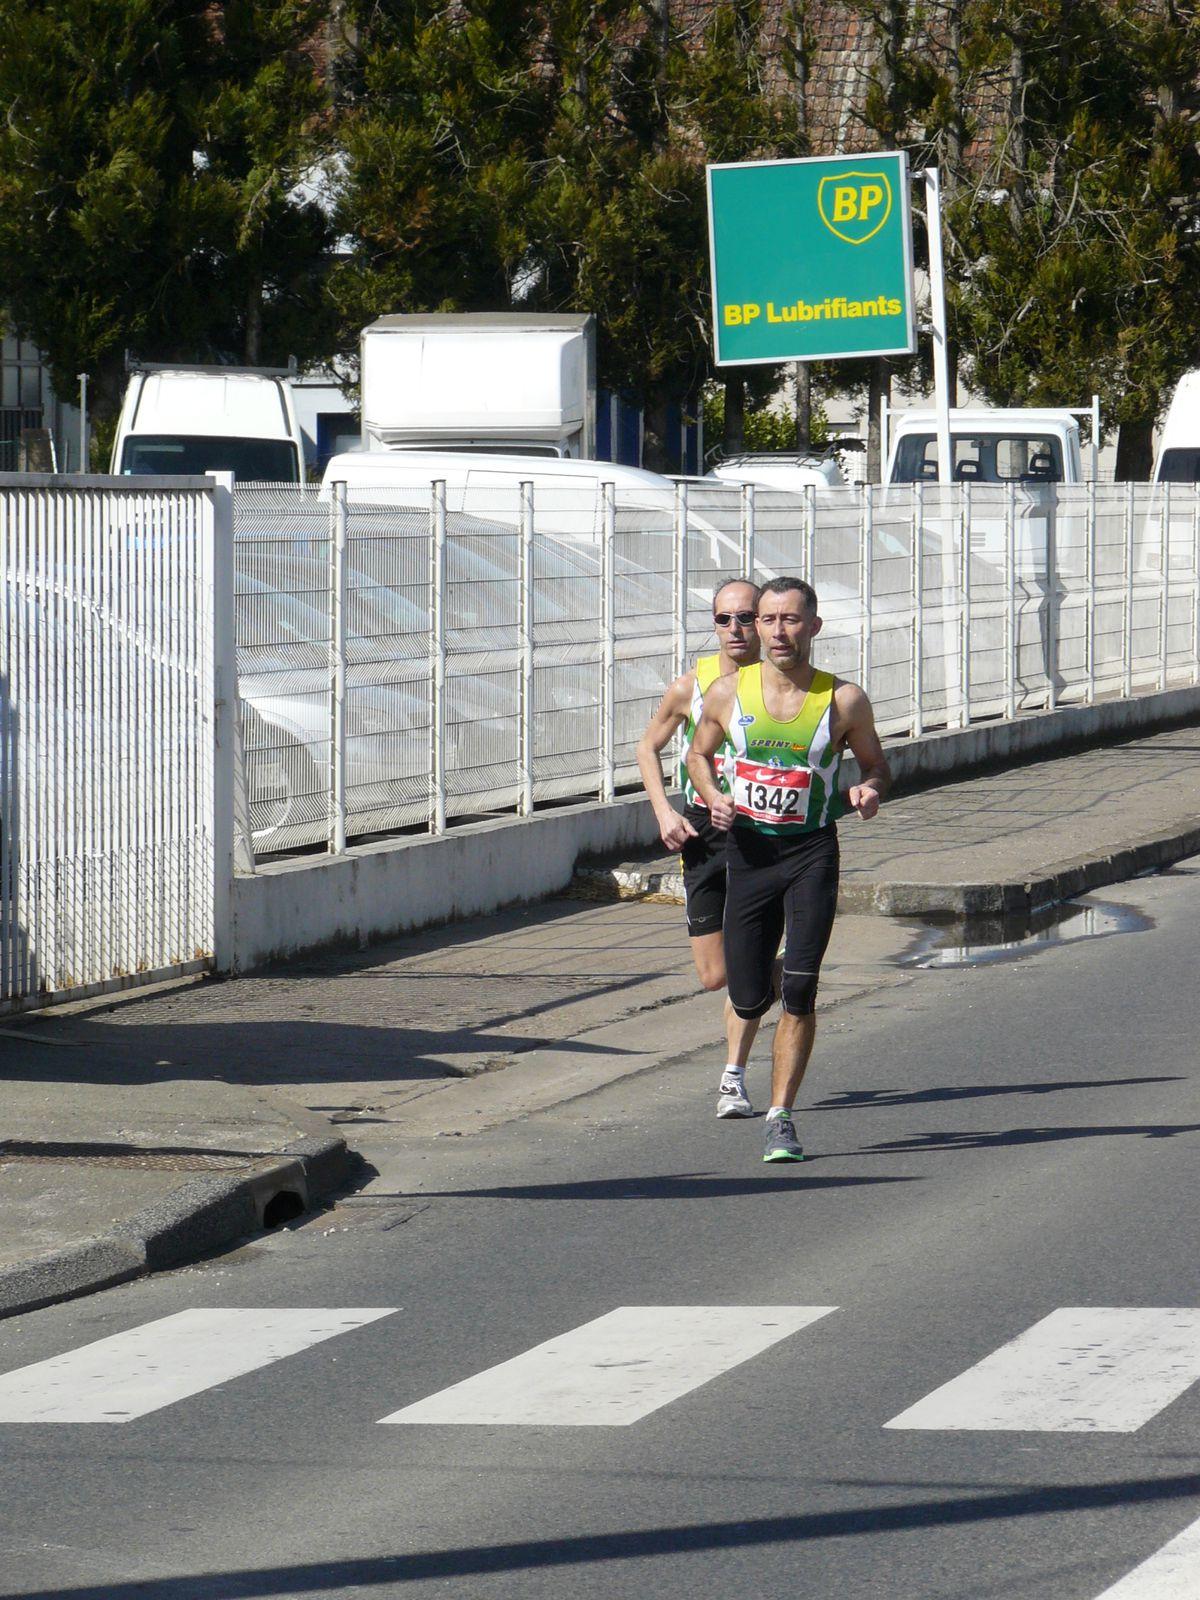 Album - Boucles-de-la-Saone-2010-10-Km----Km-1-Depart-10-Km